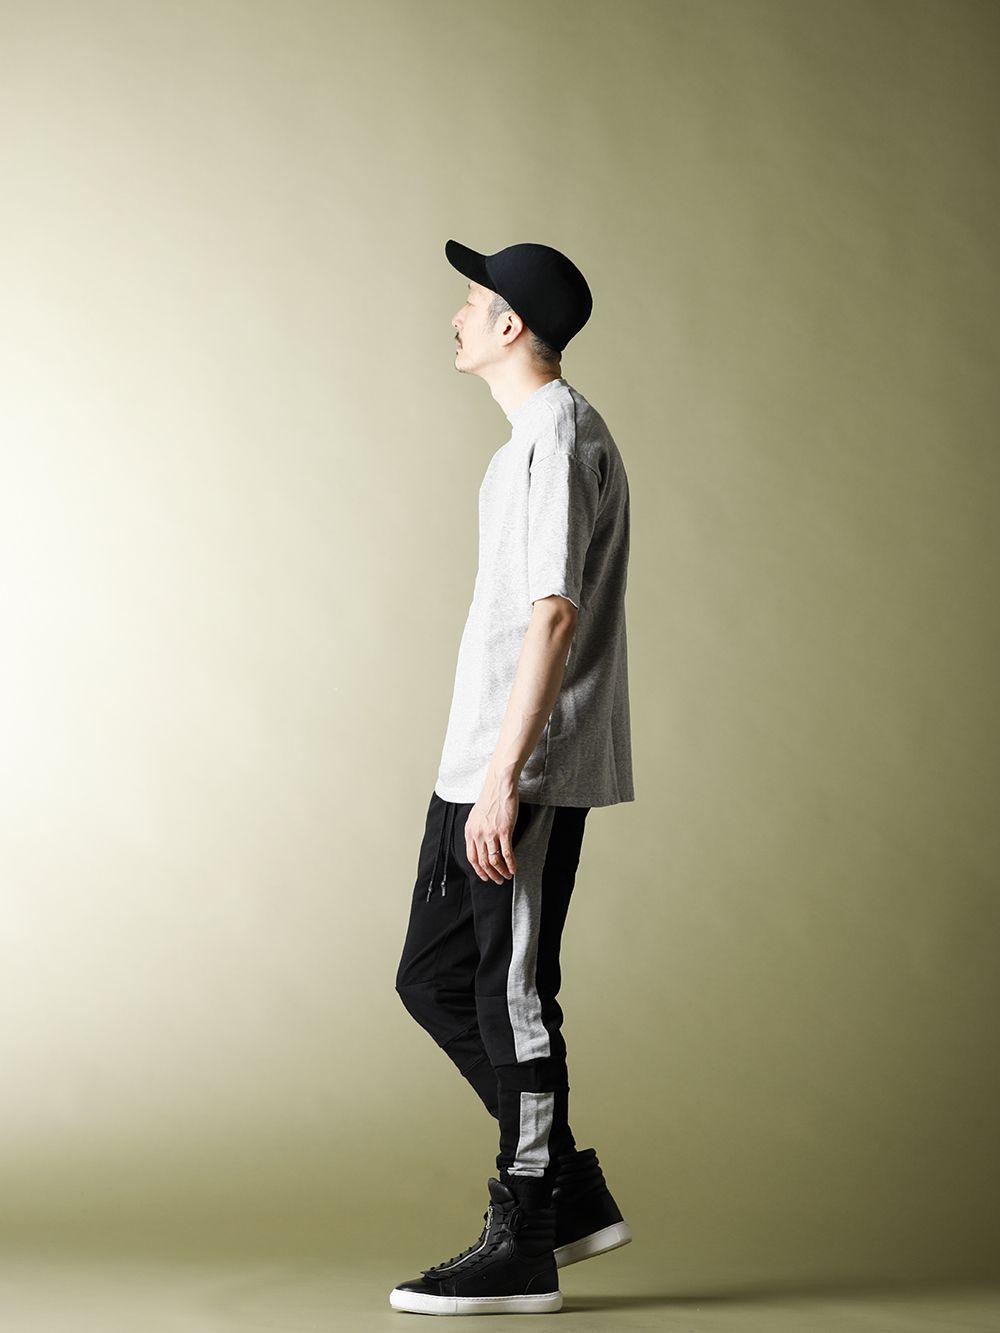 .LOGY kyoto 20SS 【 RIPVANWINKLE × VEILANCE 】BLAZER LT STYLING!!! - 3-002